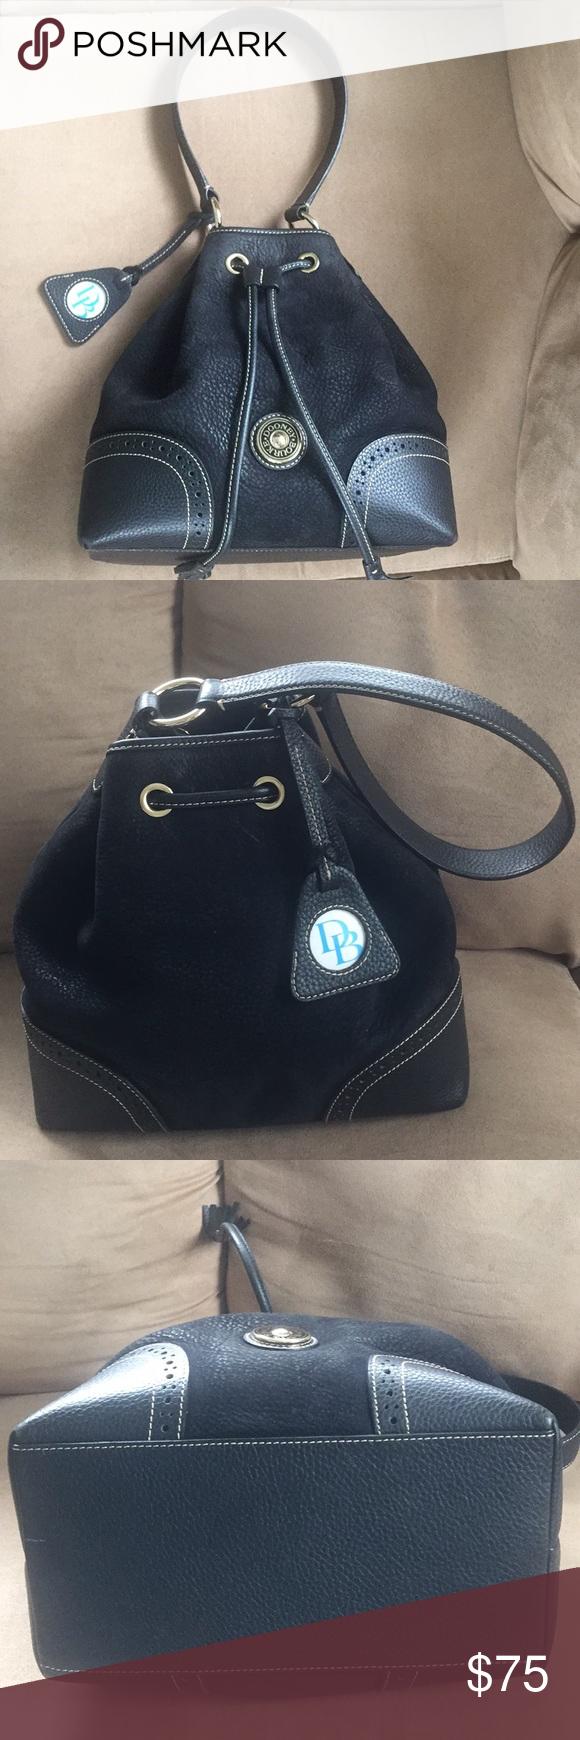 Bourke Black Suede Bucket Bag